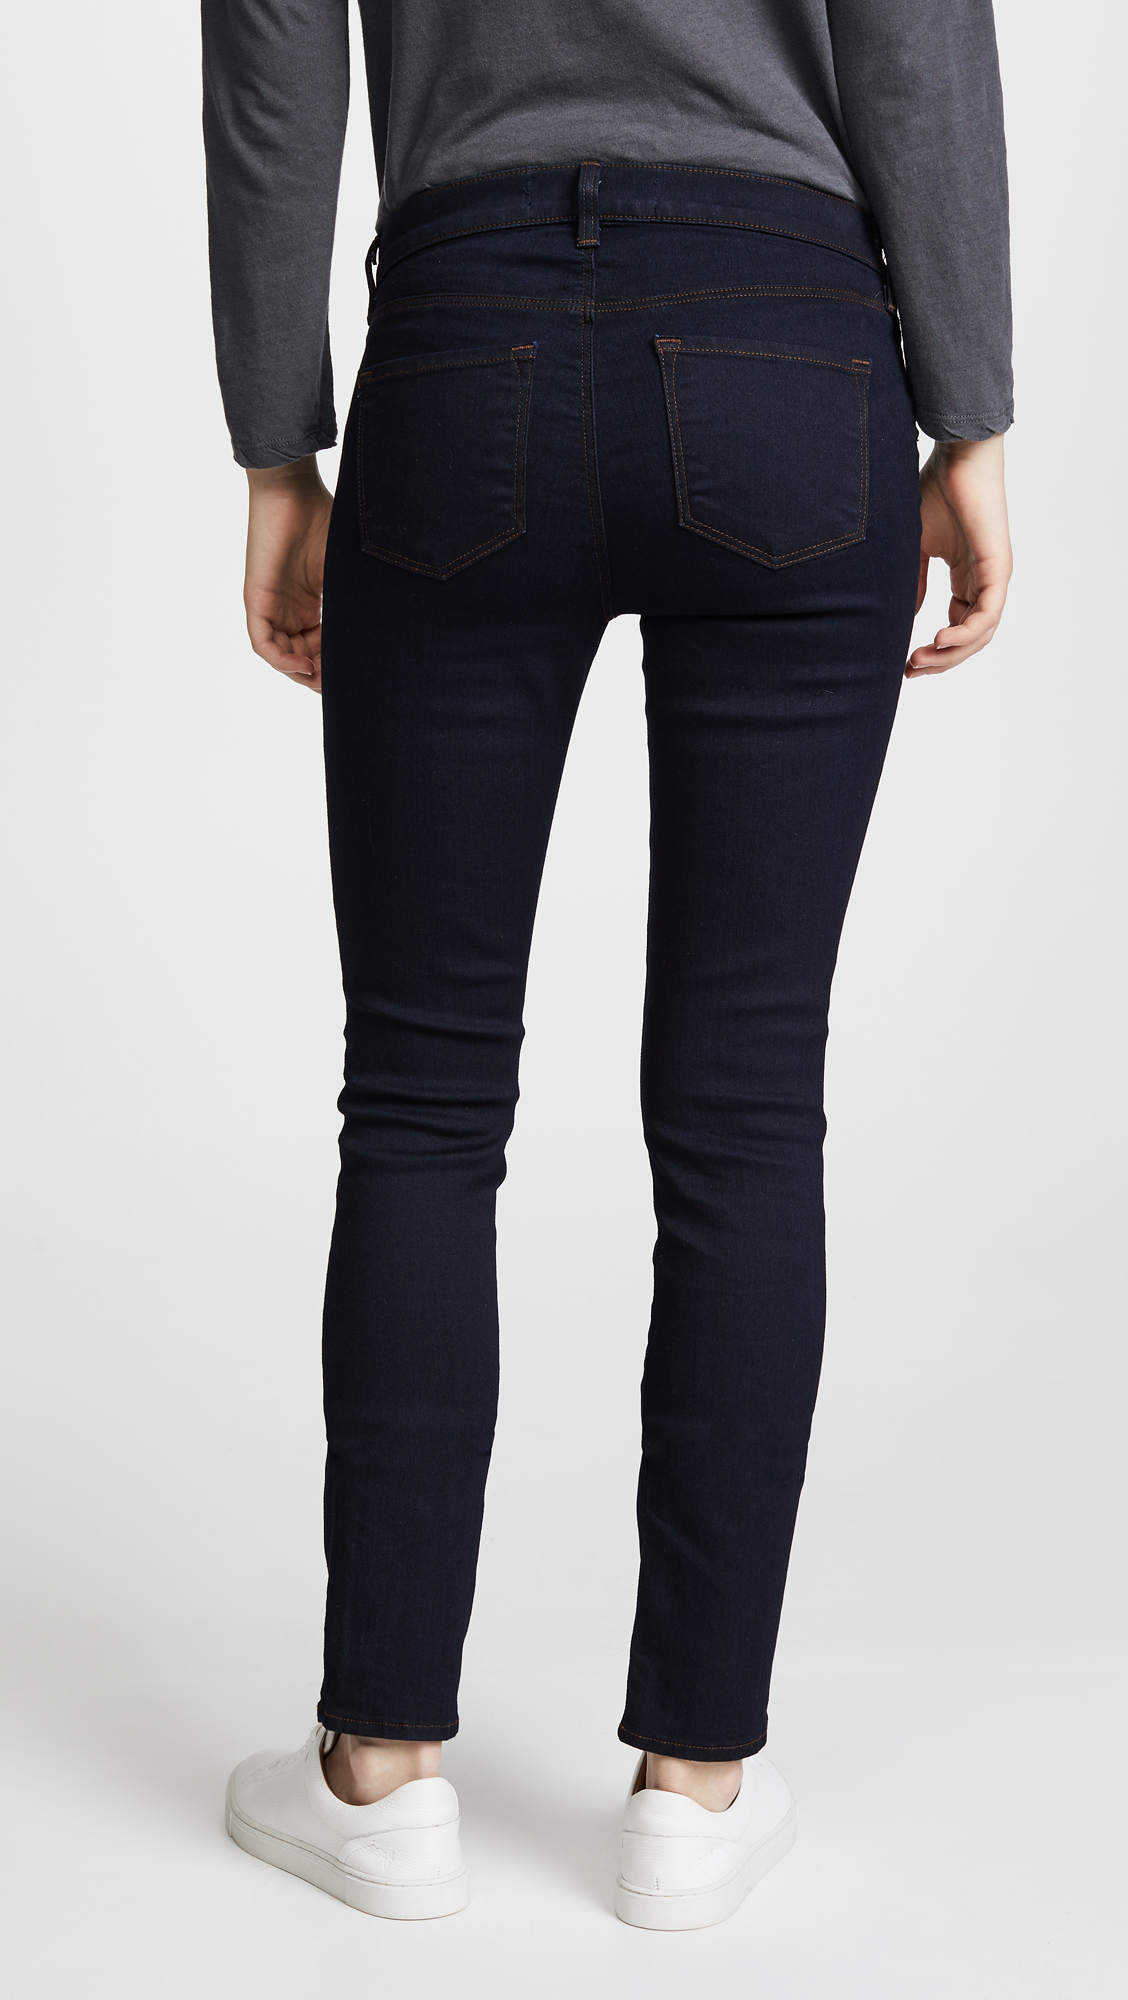 d9448c37c0e0d J Brand 3411 Maternity Skinny Jeans | SHOPBOP